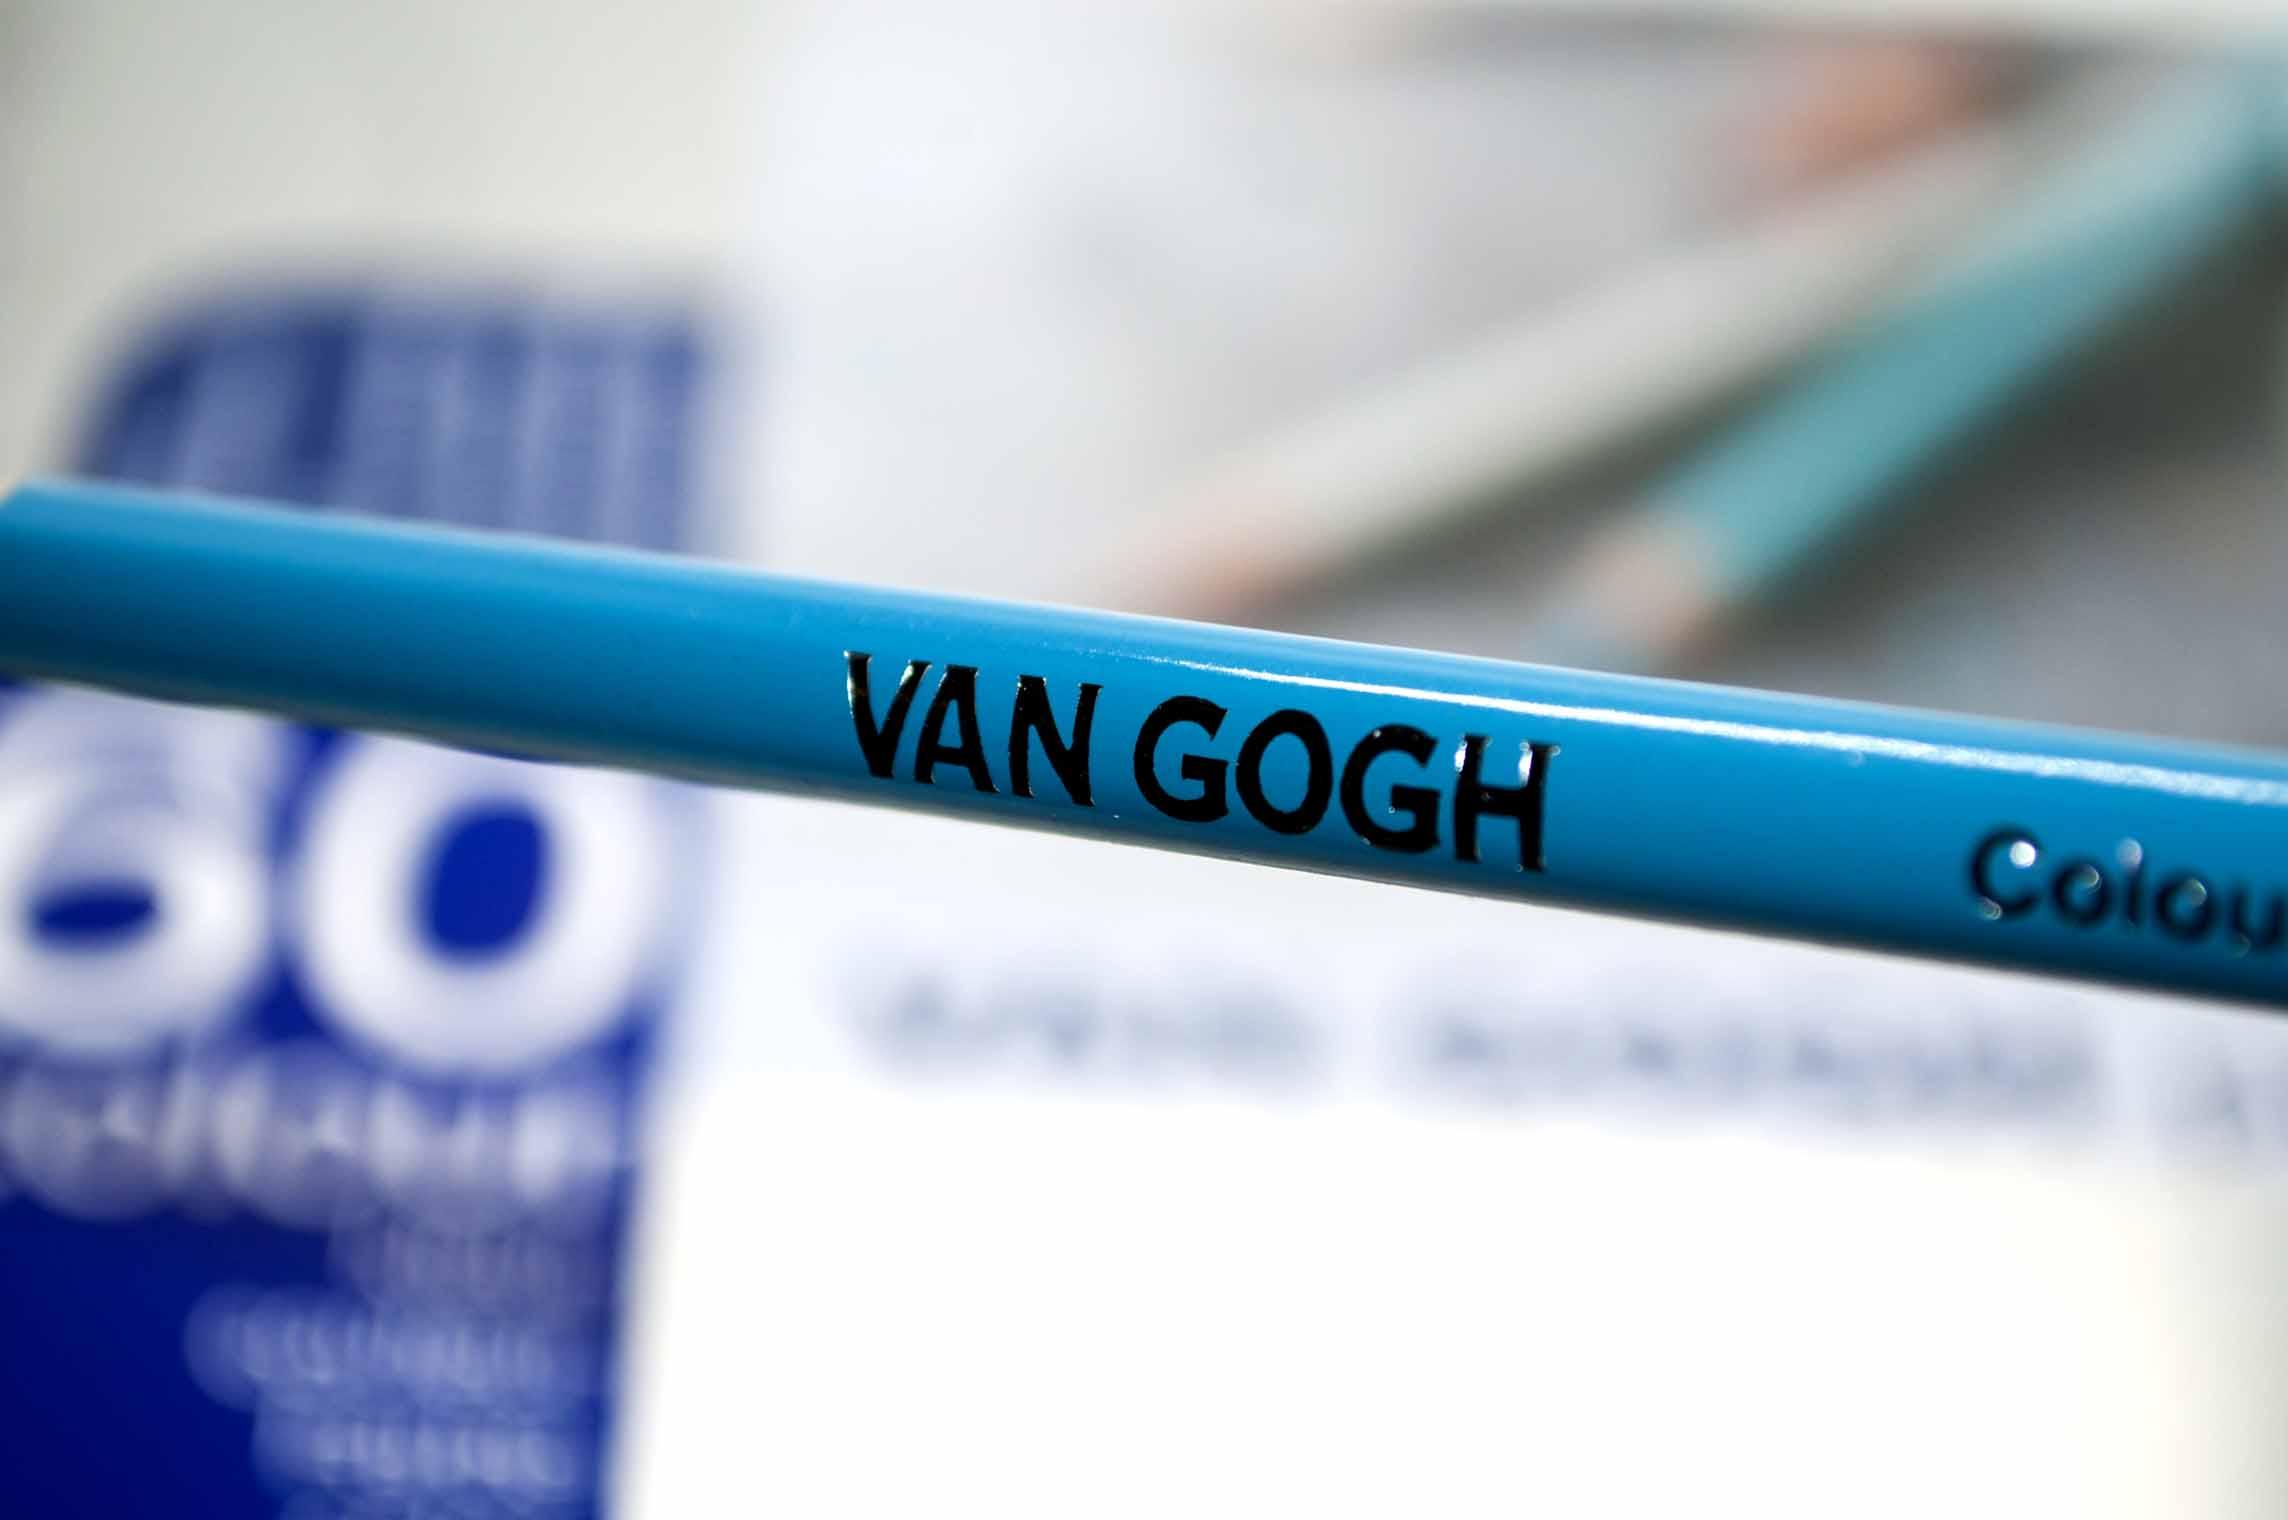 Van Gogh Name on The Barrel.jpg